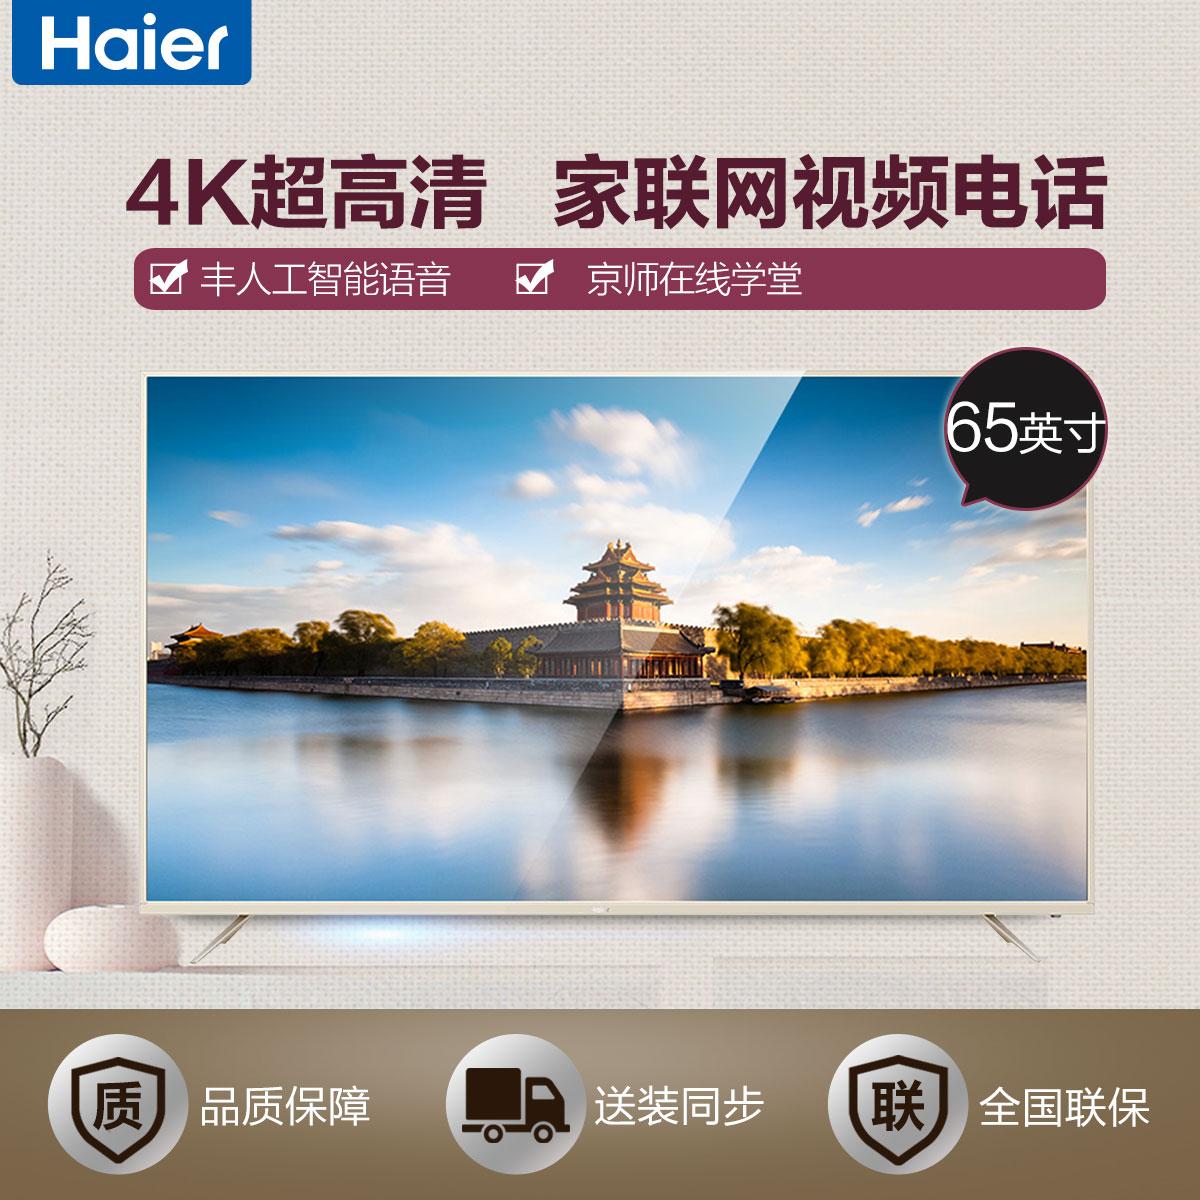 Haier/海尔             4K电视             LS65AL88K81